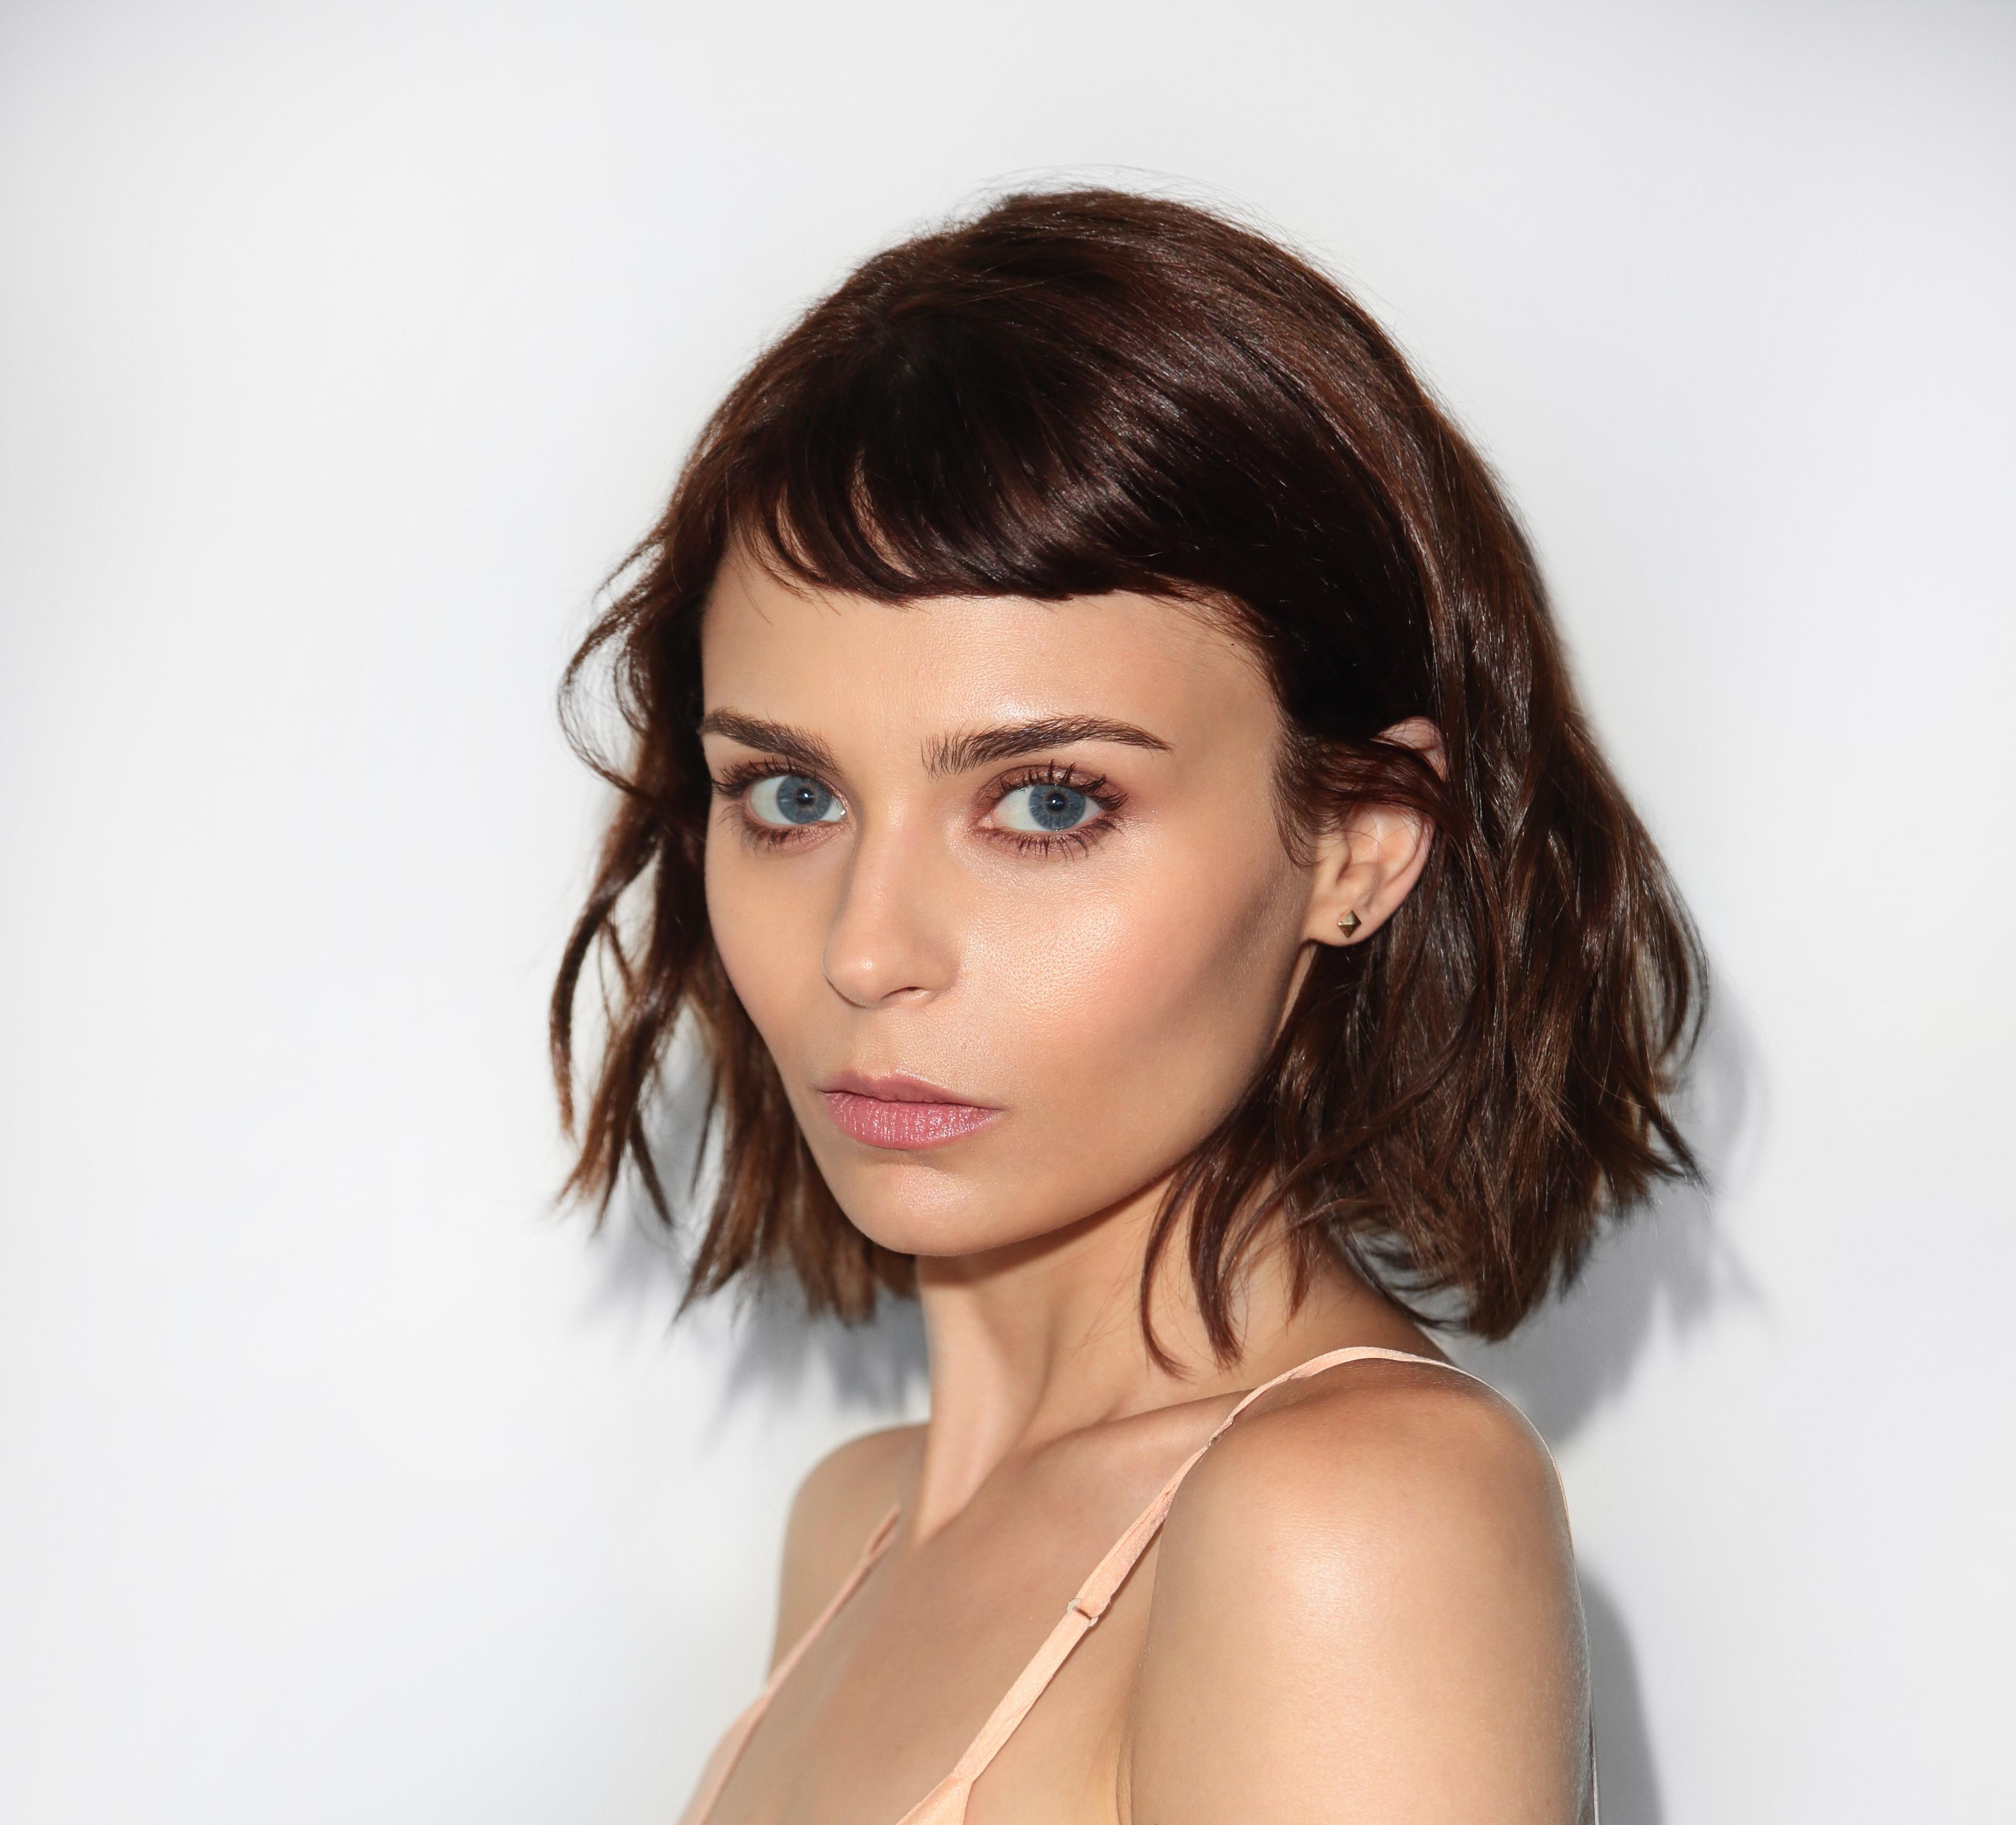 Alexandra Krosney nude photos 2019